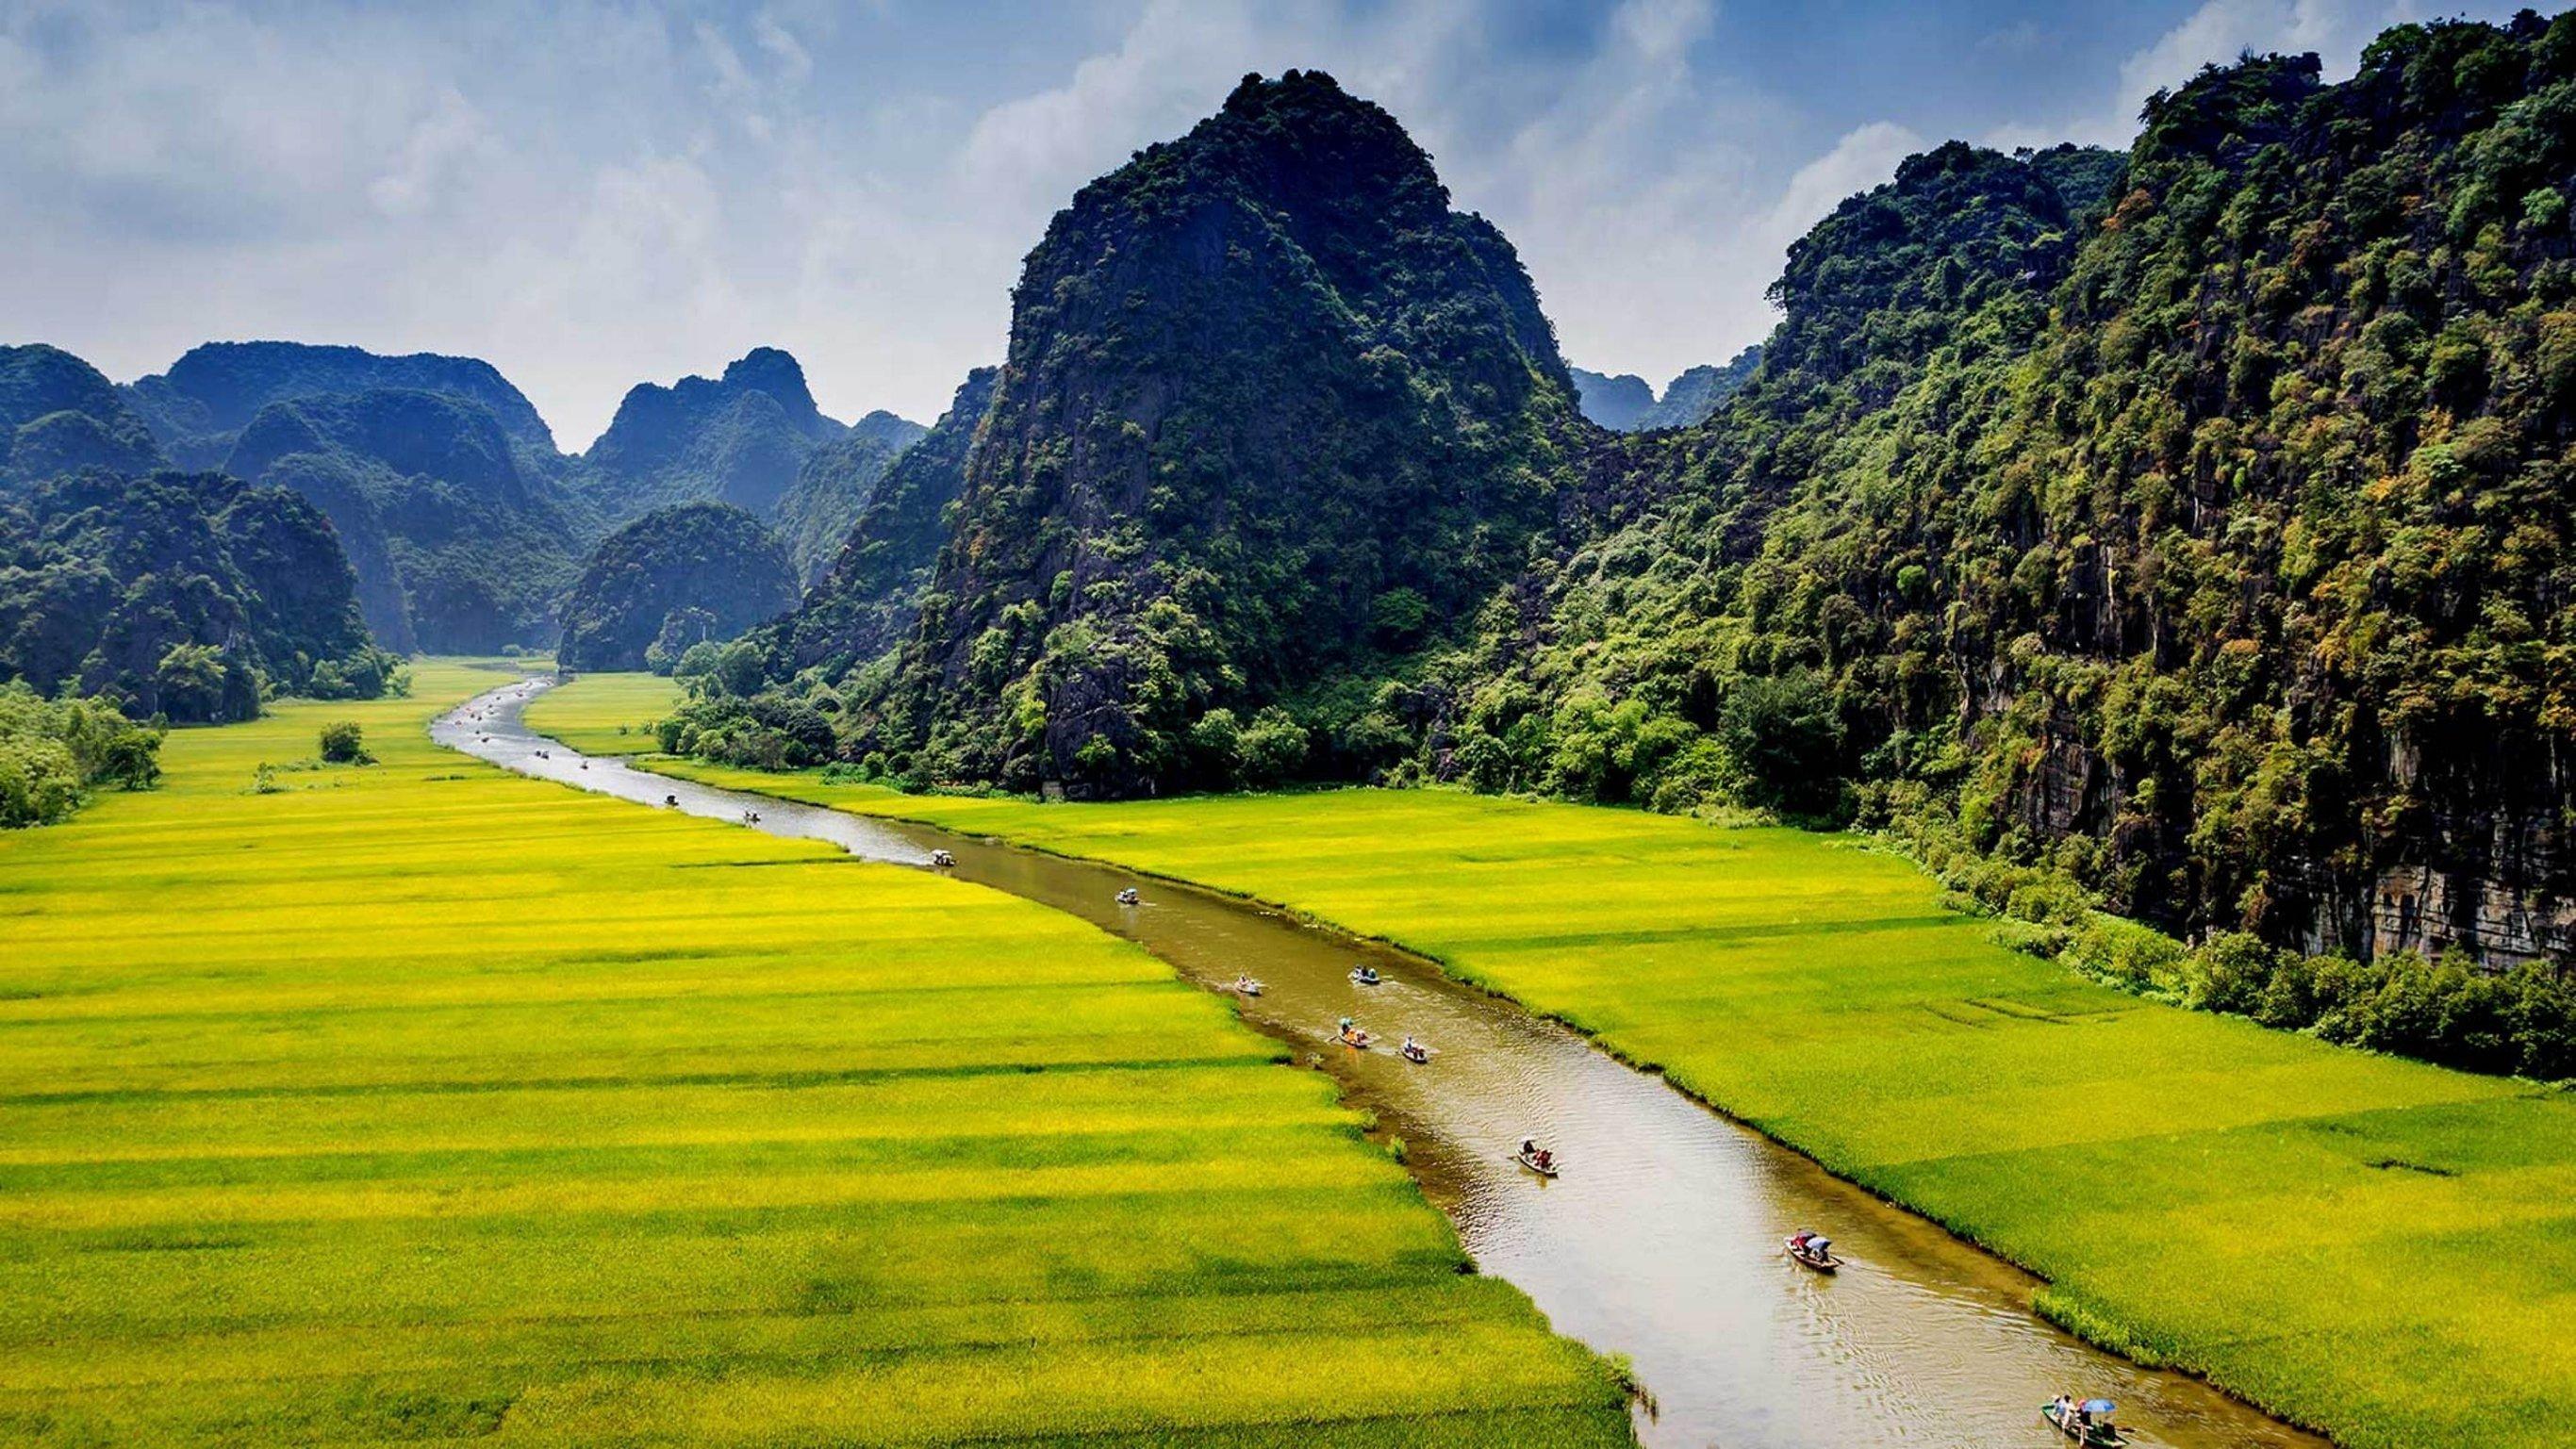 1-Day Hanoi to Ninh Binh - Vietnam Itinerary